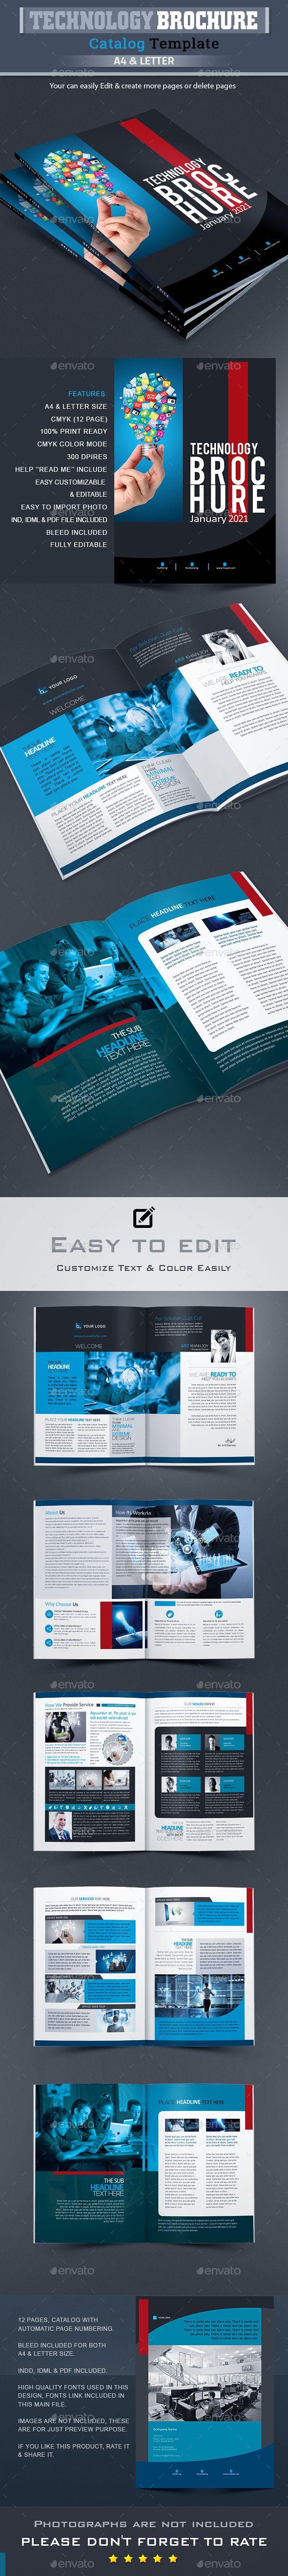 Technology Brochure Catalog Design  Brochures Print Templates